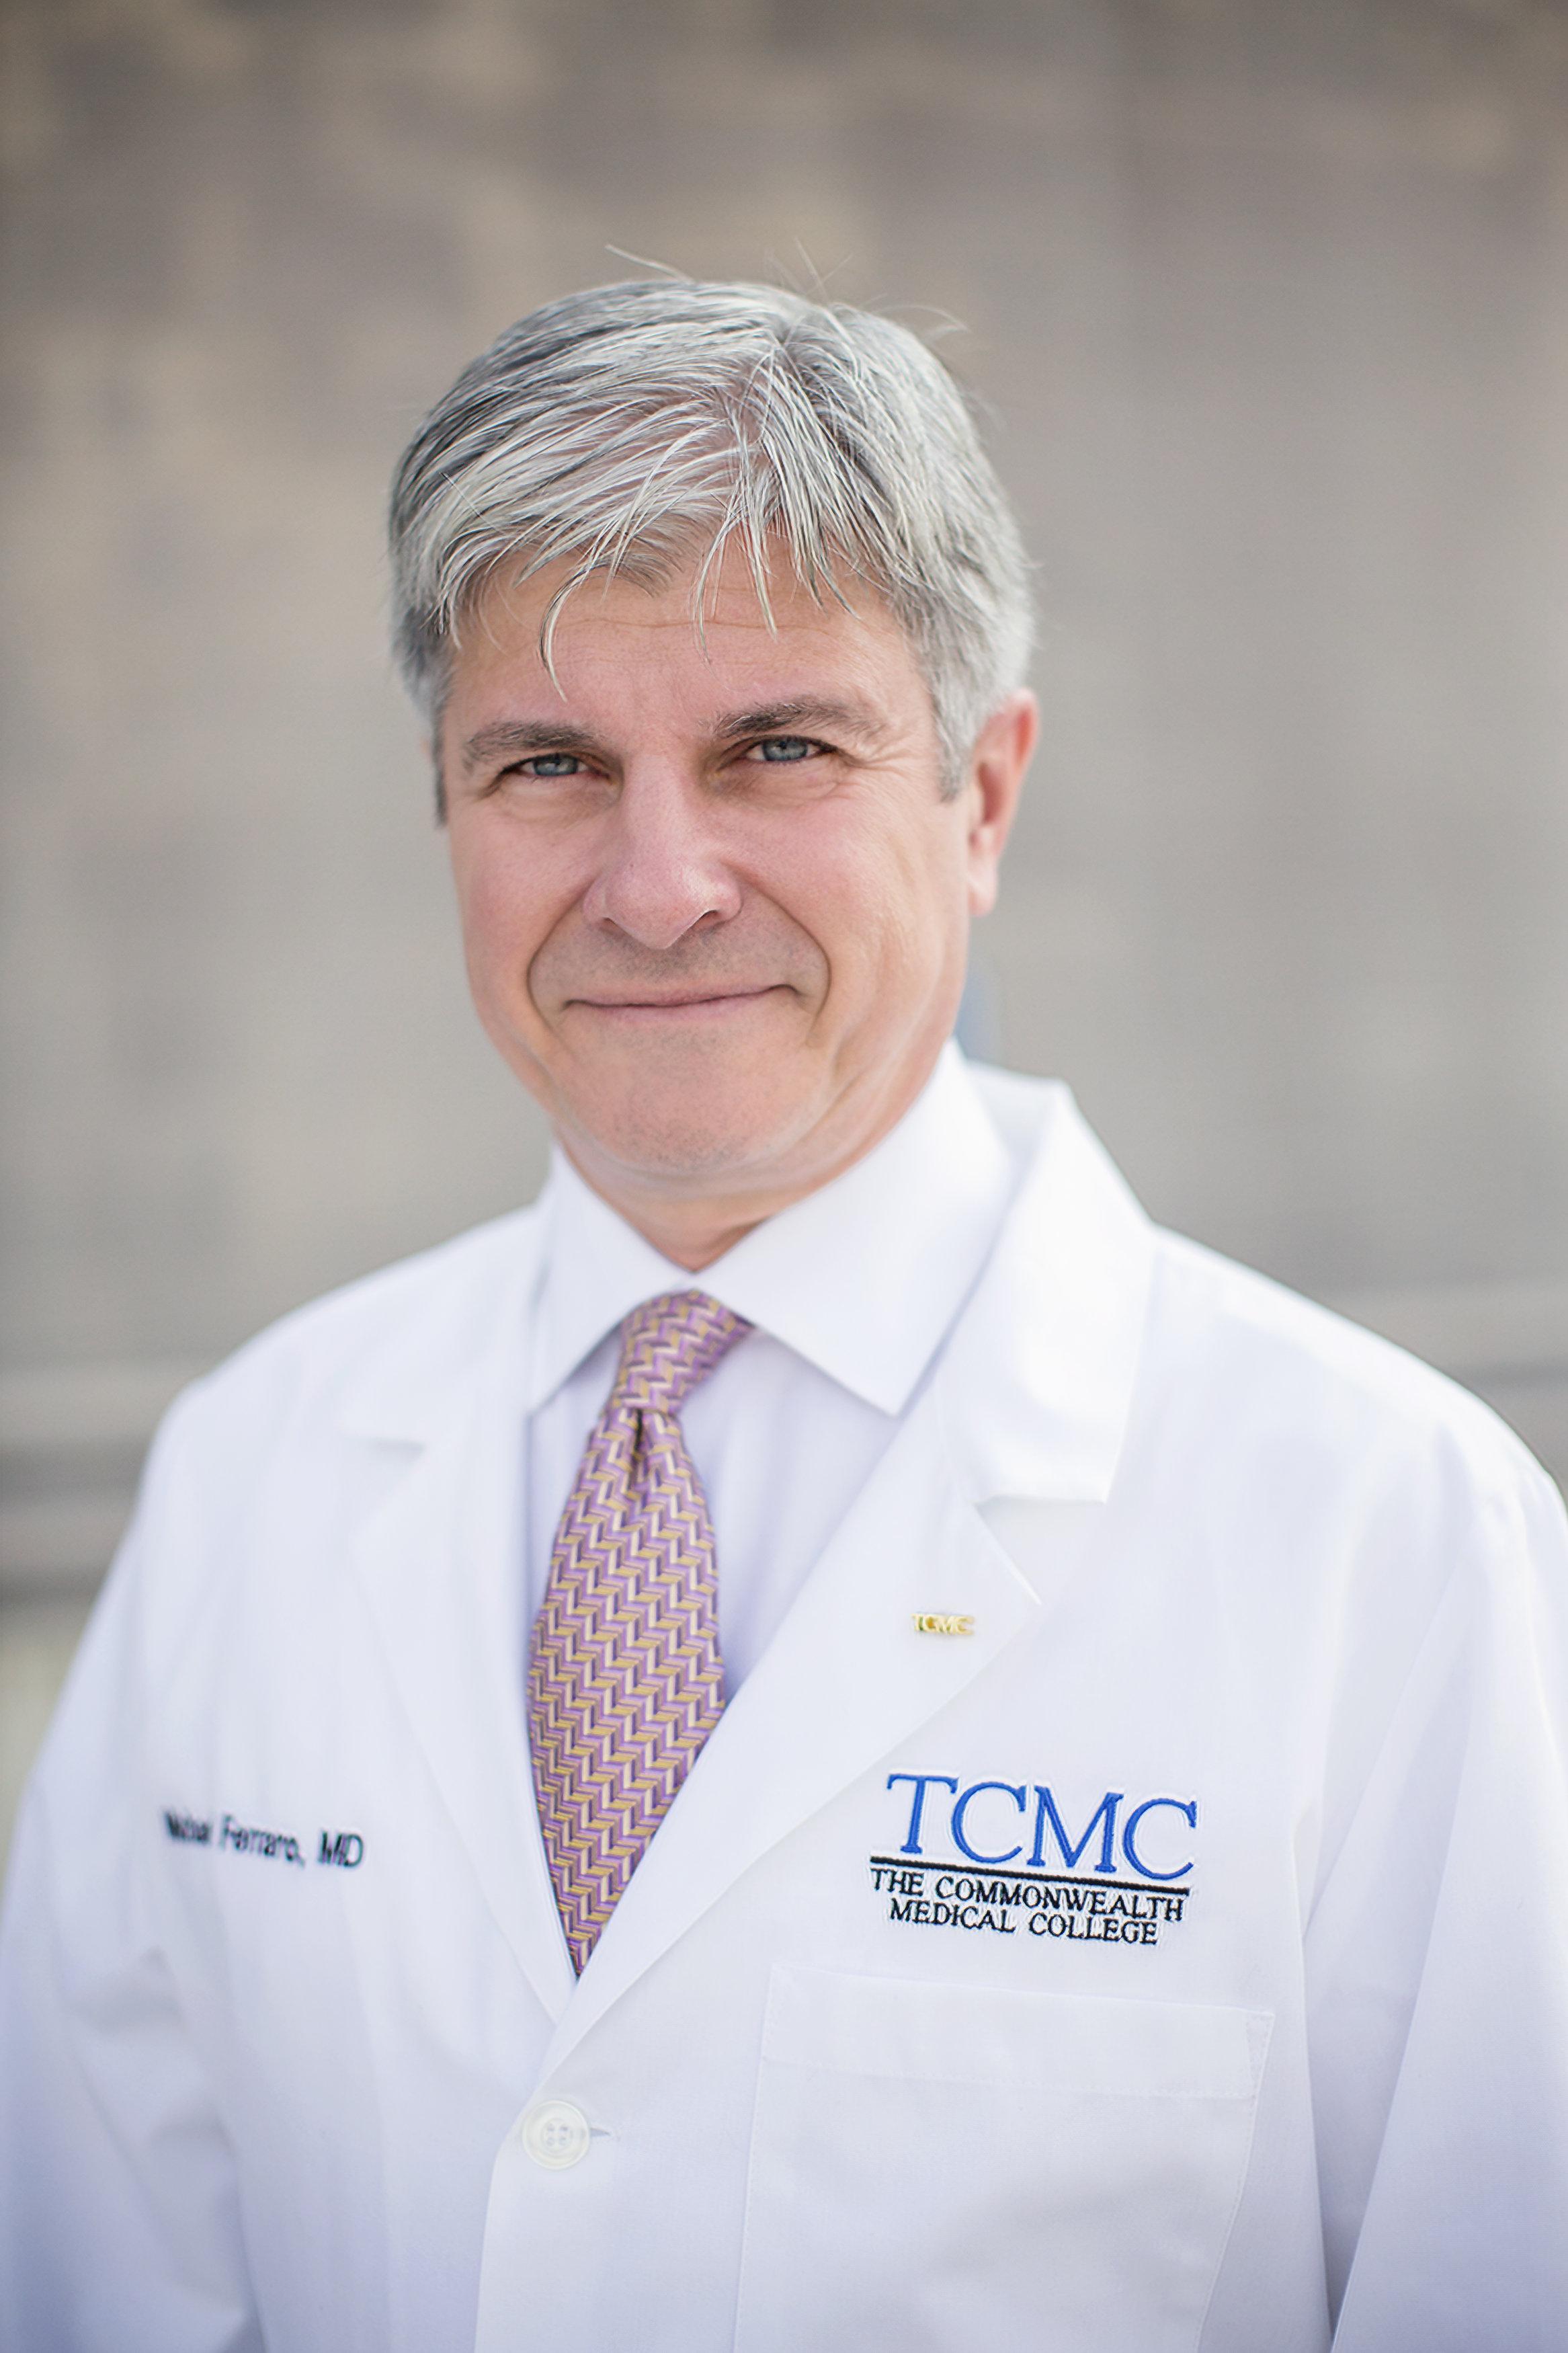 Michael M Ferraro, MD, FACOG